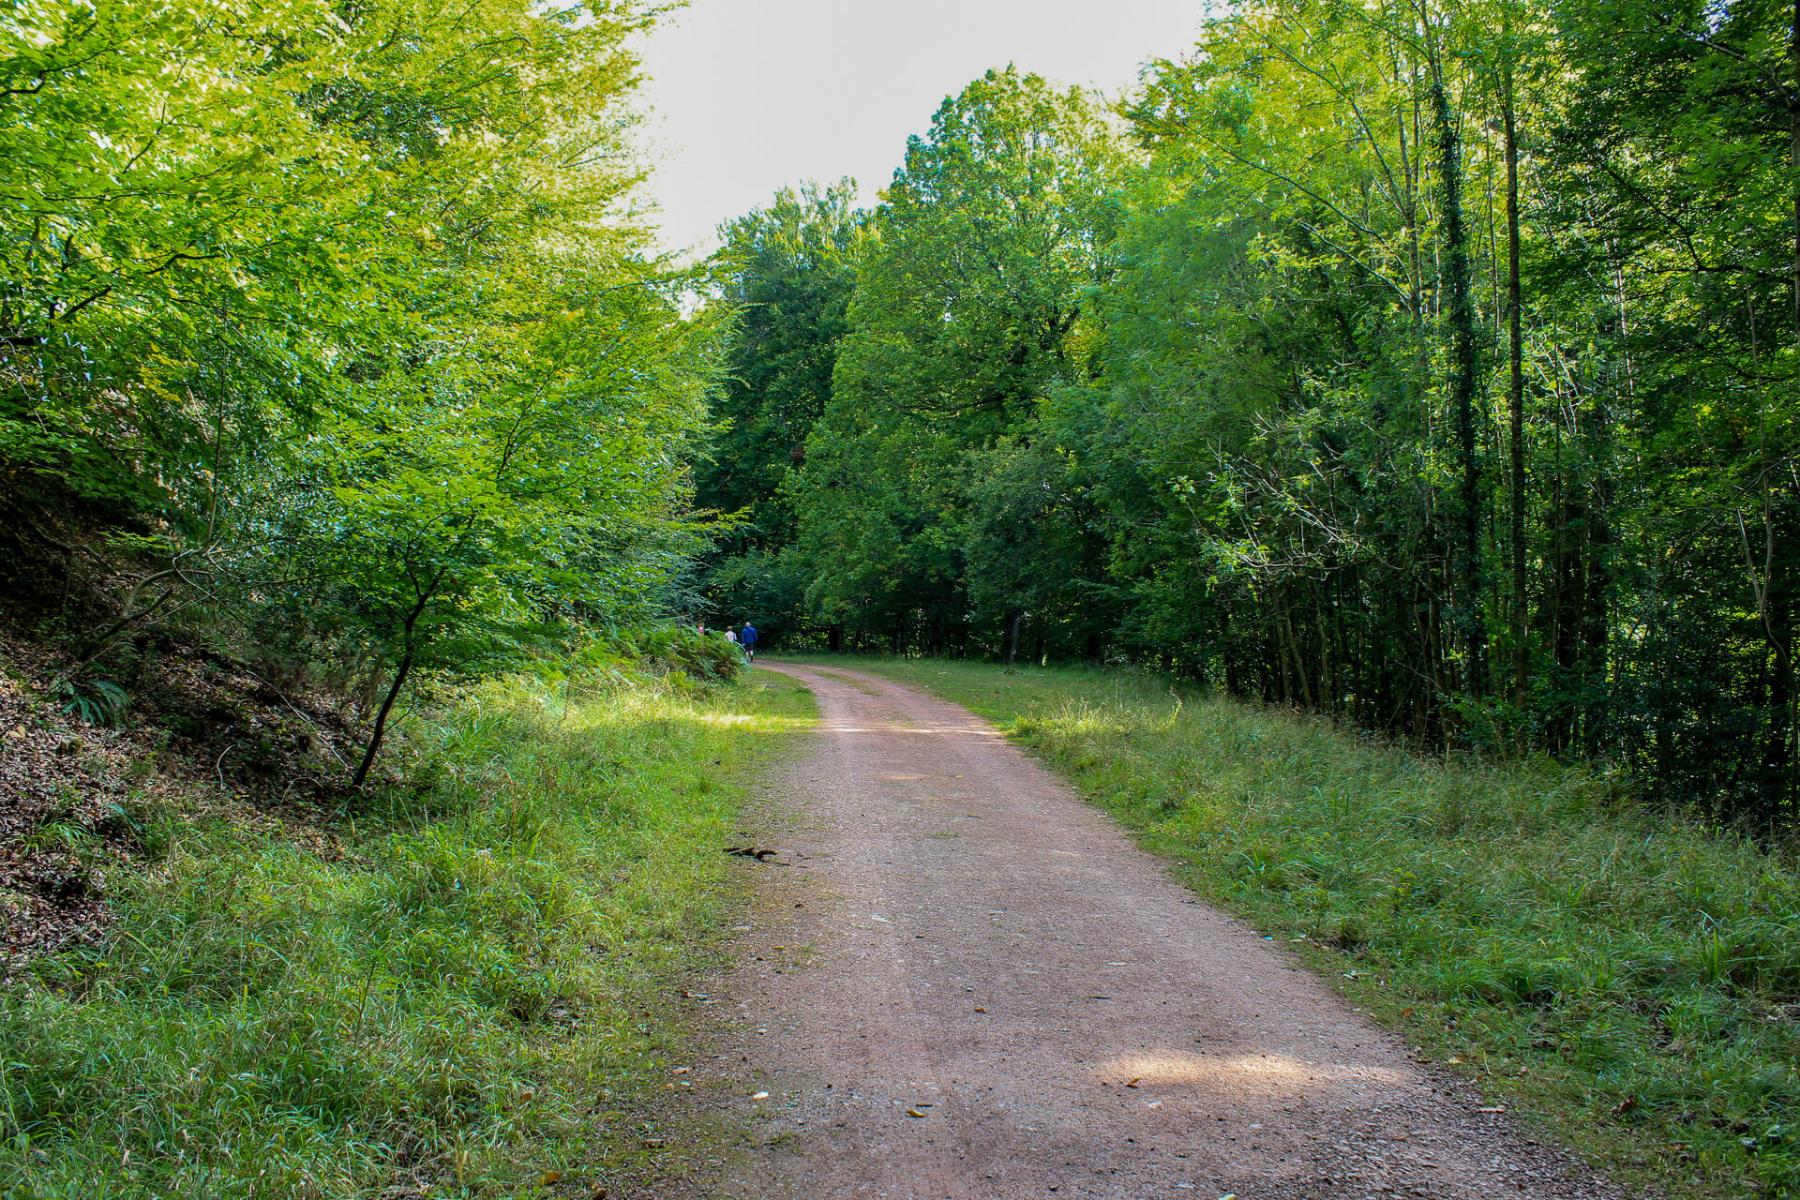 walk-back-to-symonds-yat-car-park-wye-valley